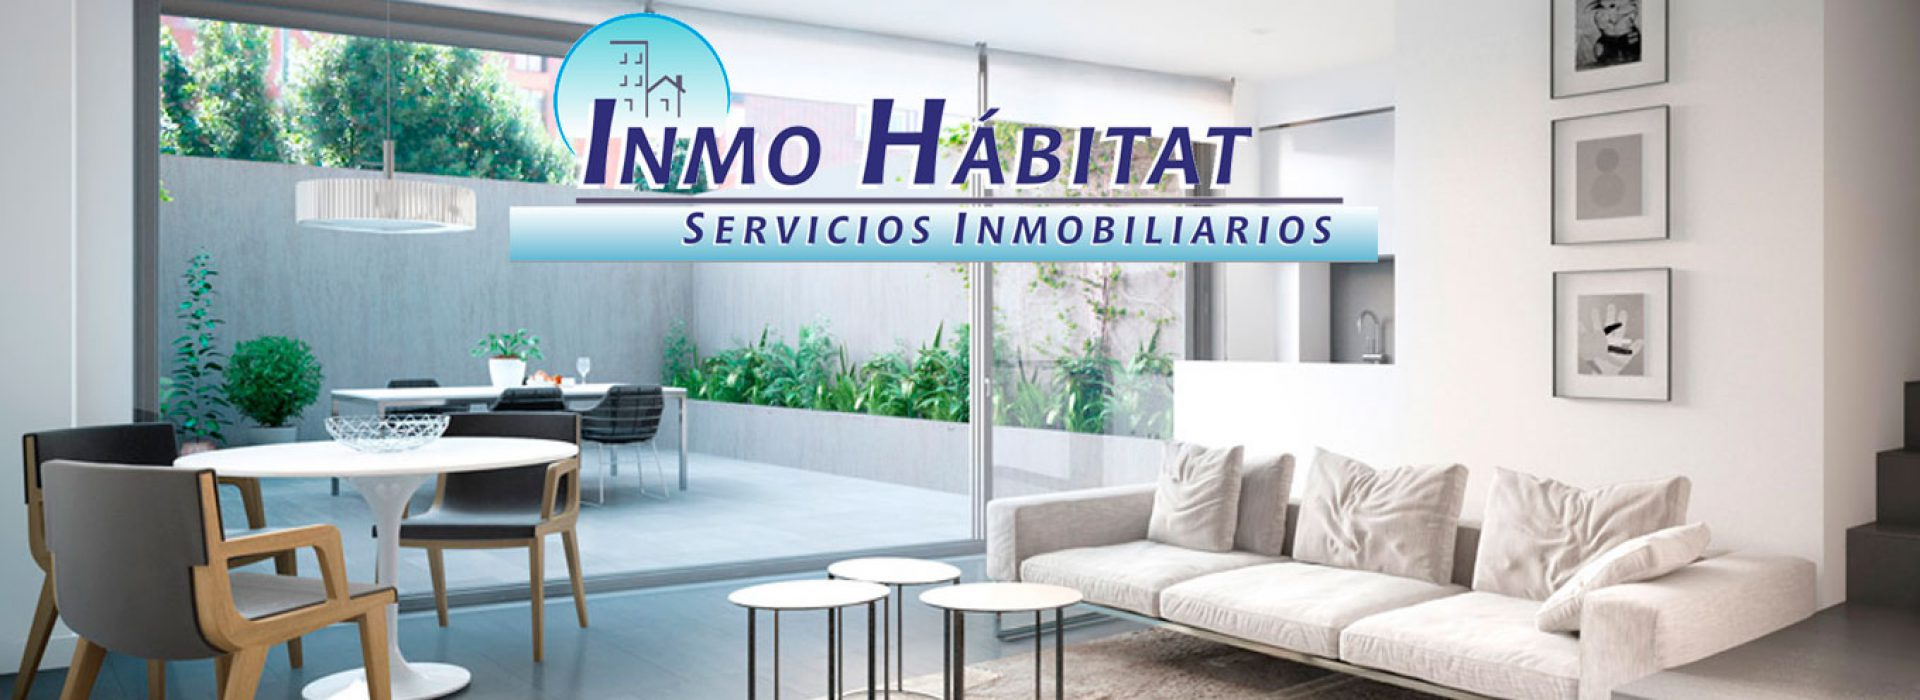 Inmo Habitat